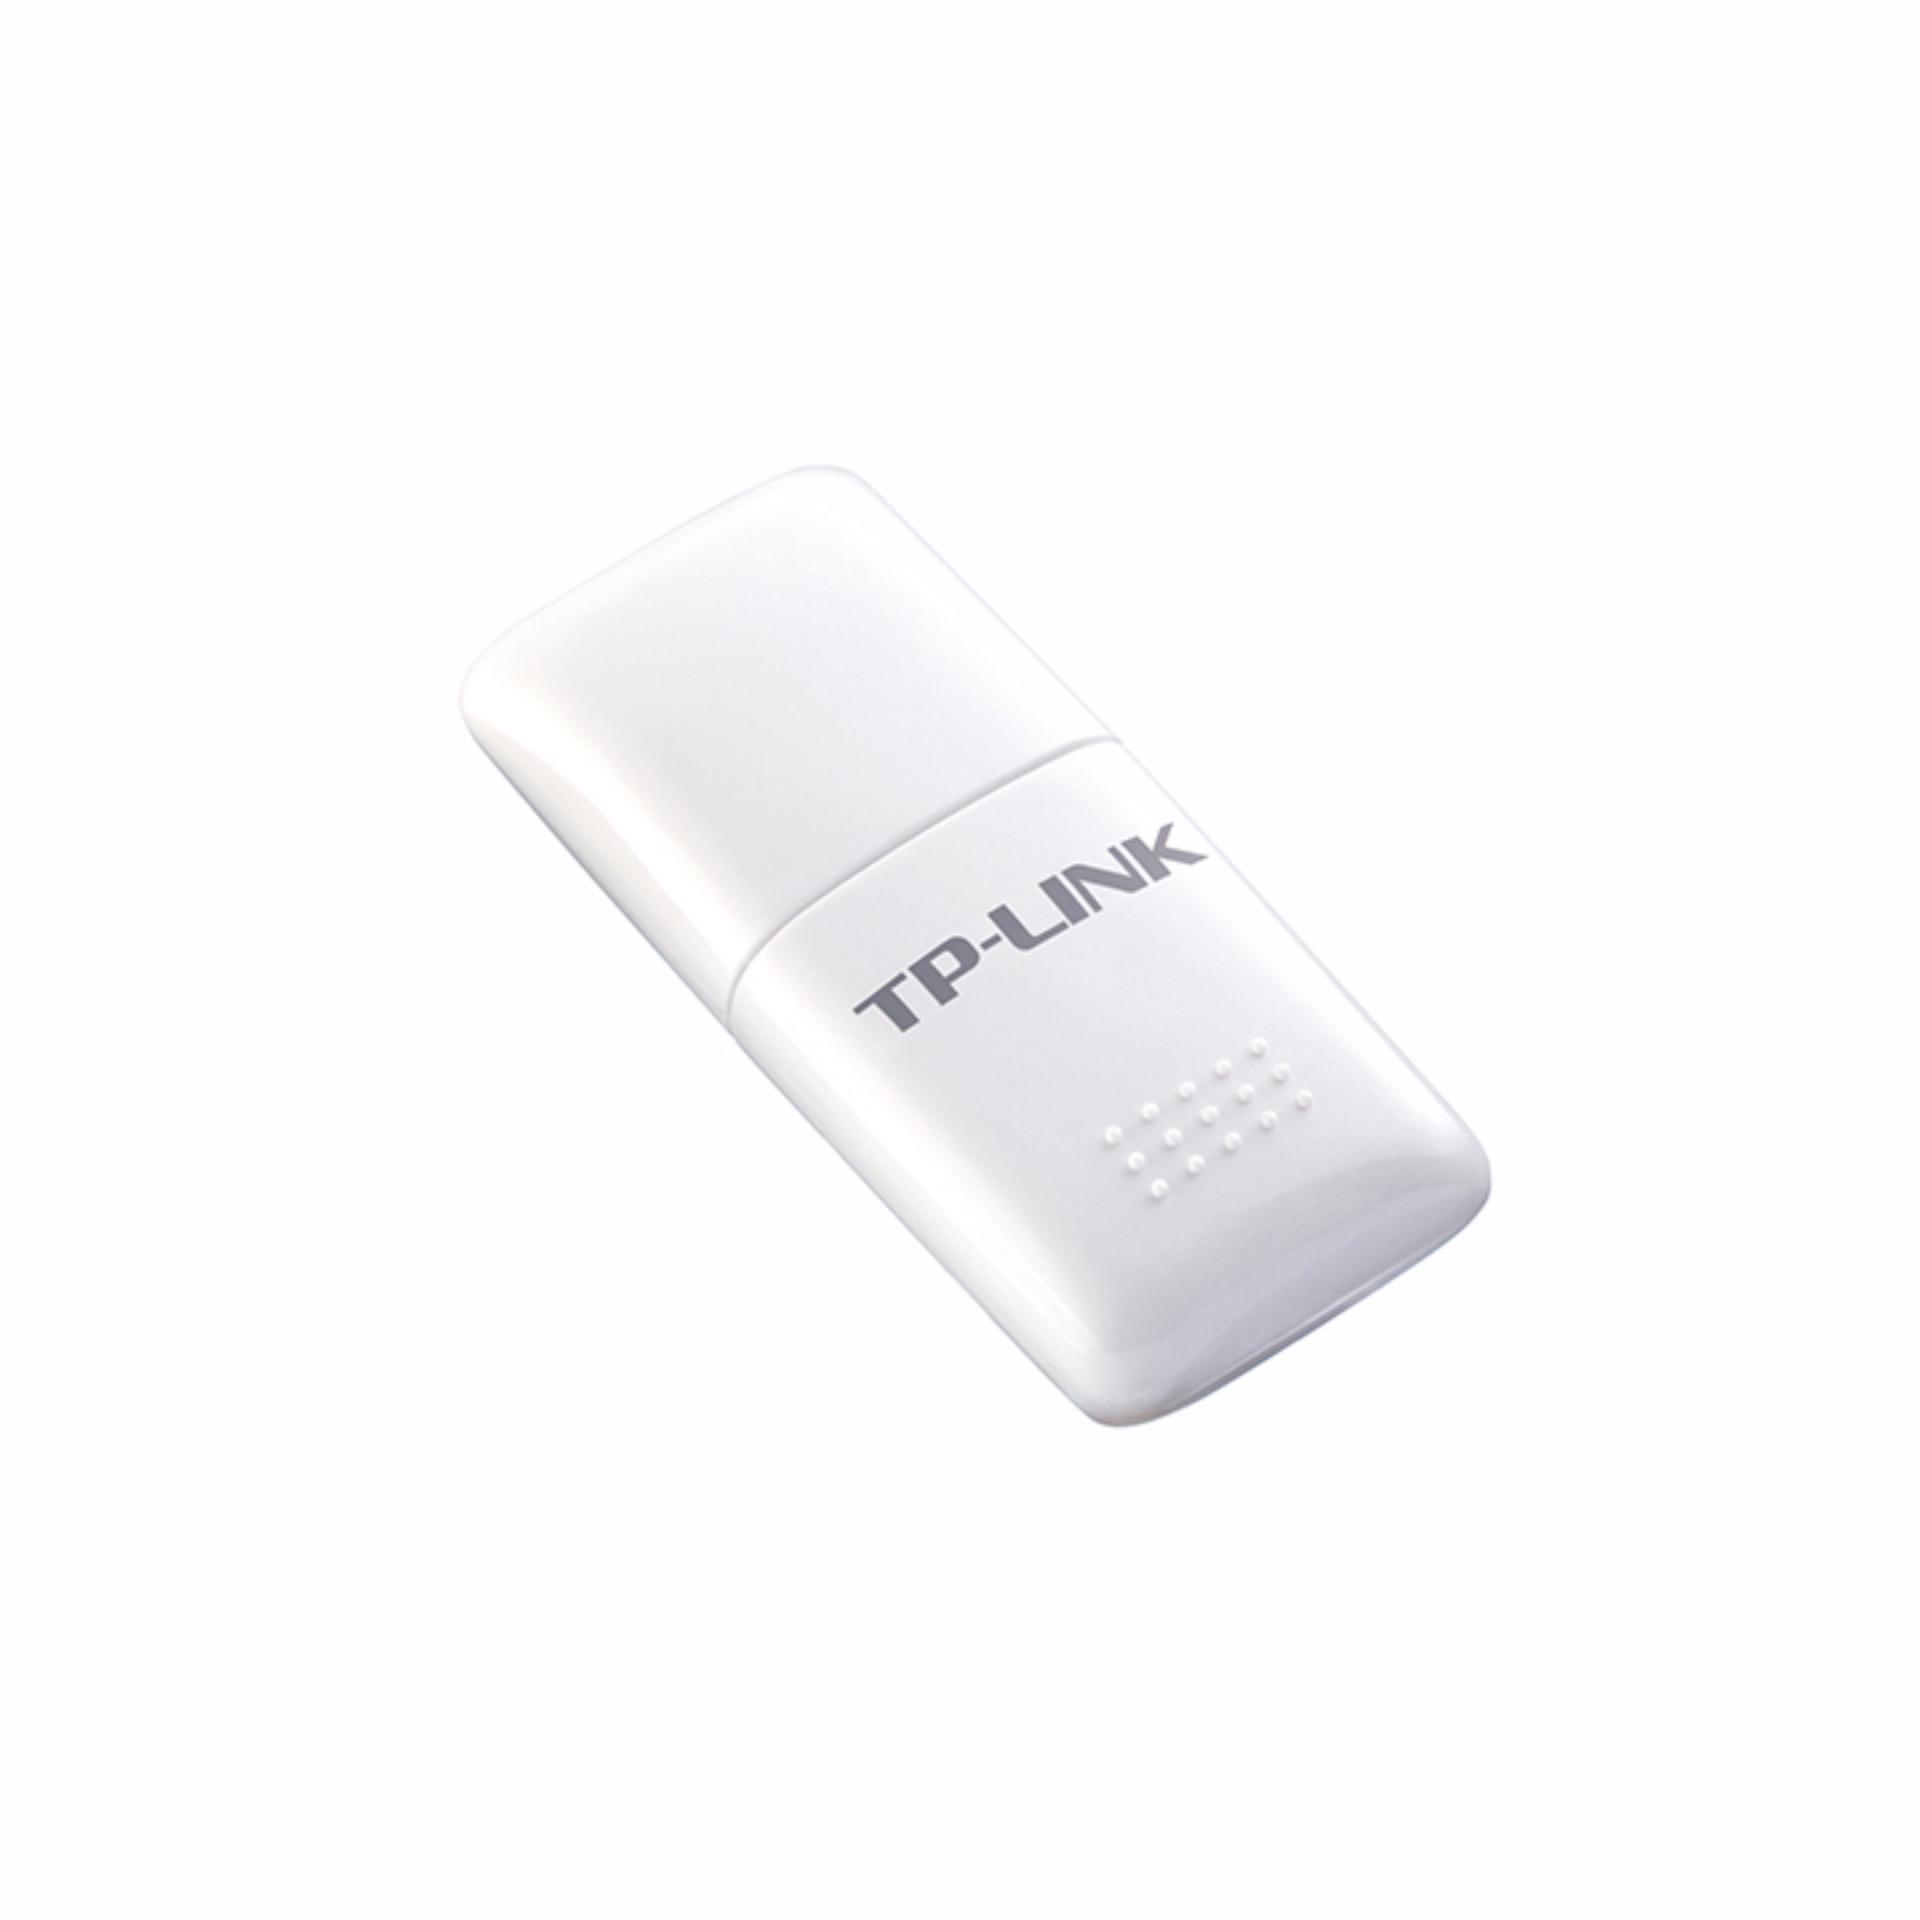 USB thu Wifi TP Link TL-WN723N